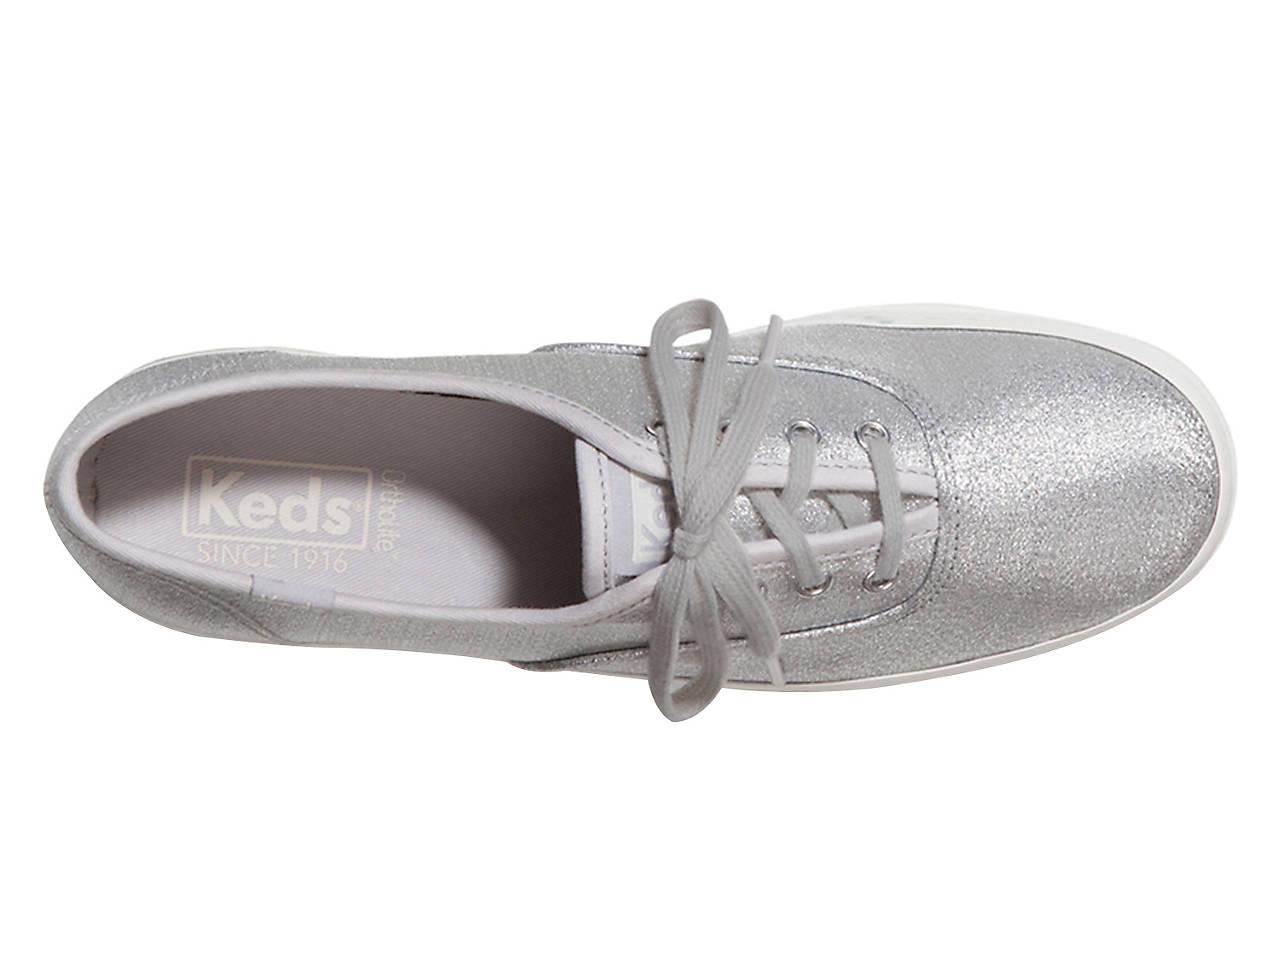 ba55f6c44cc Keds Champion Lurex Sneaker - Women s Women s Shoes